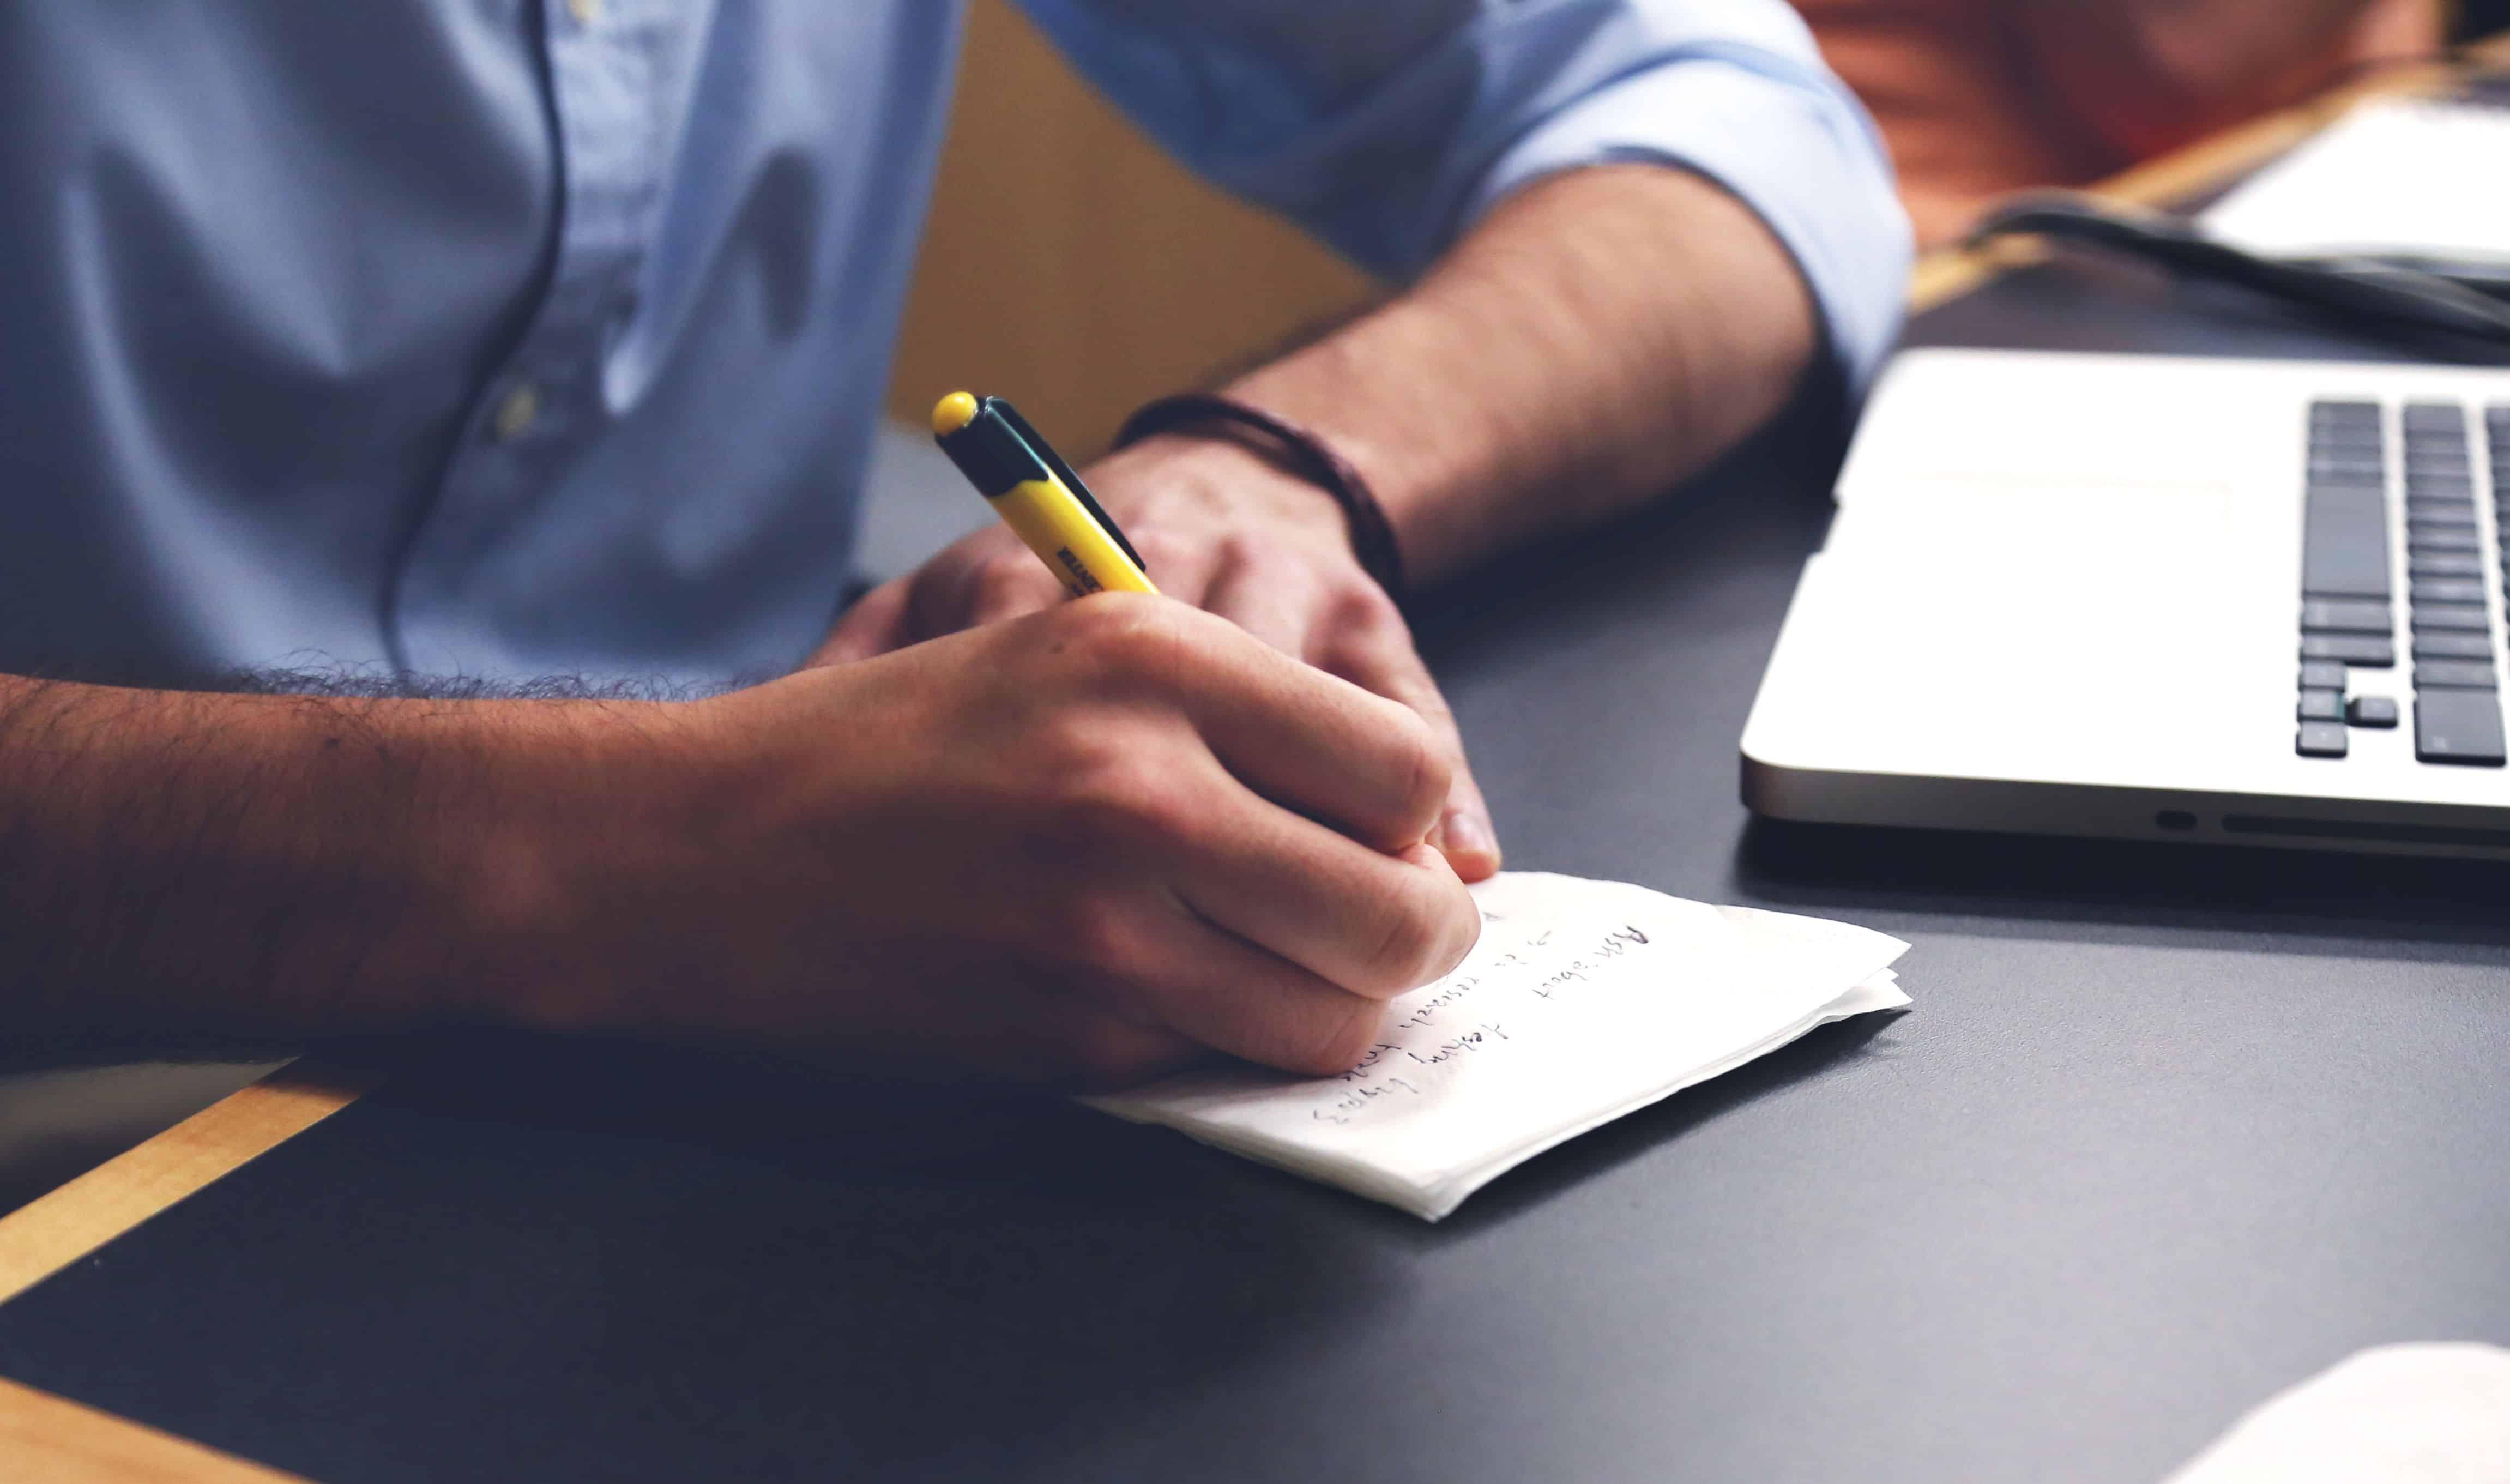 5 ways qualify sales prospects